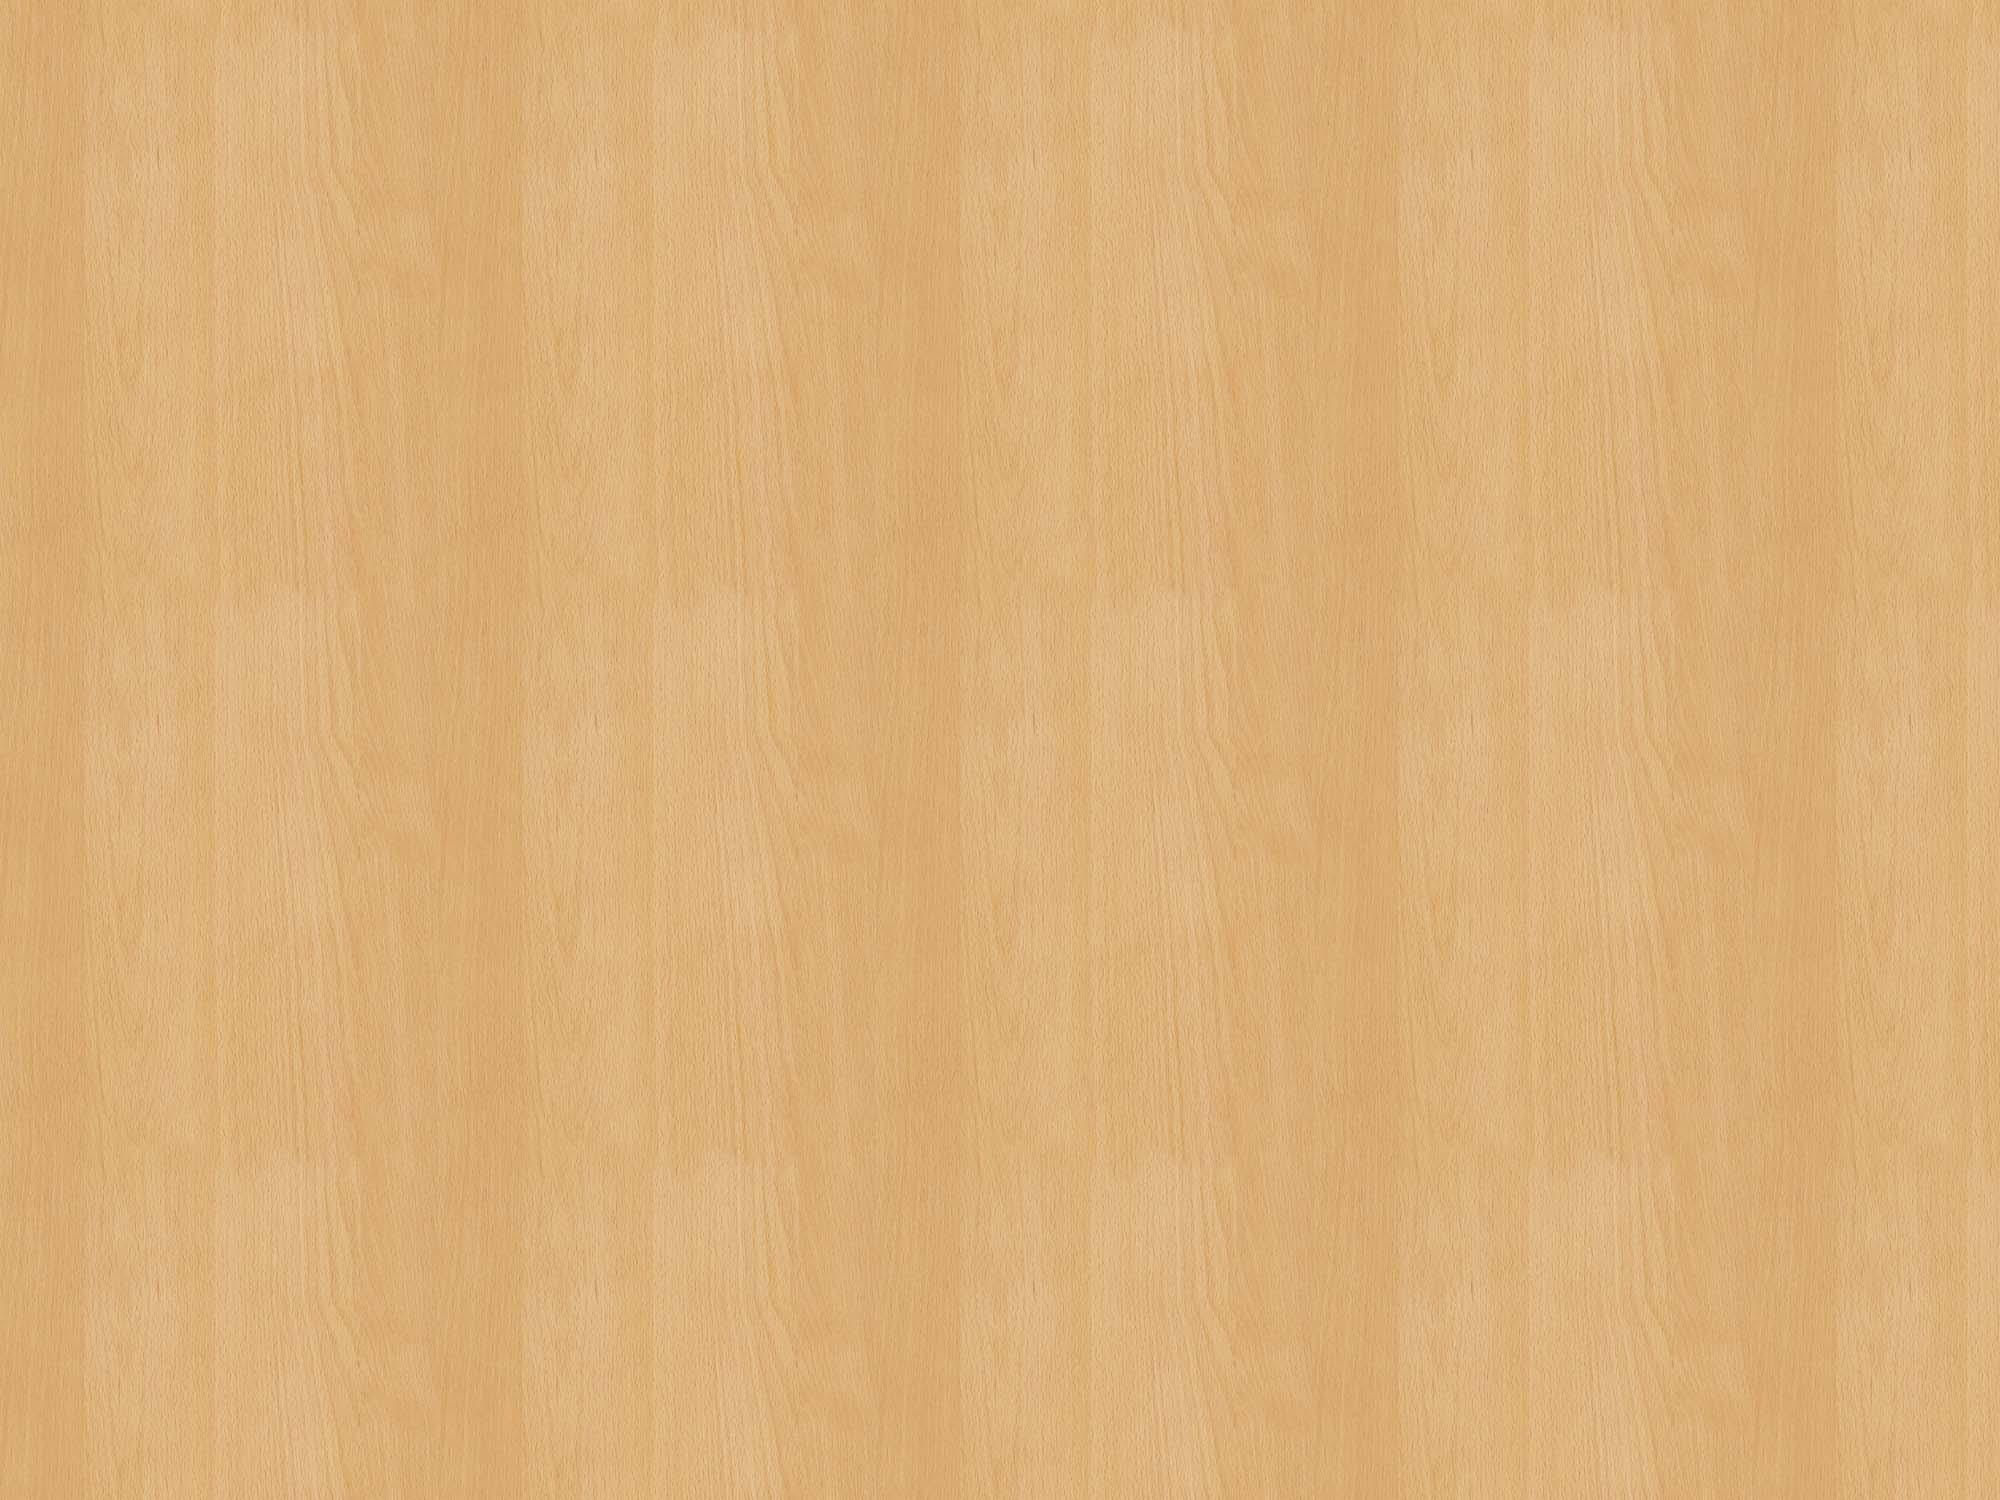 Wood Pattern 5